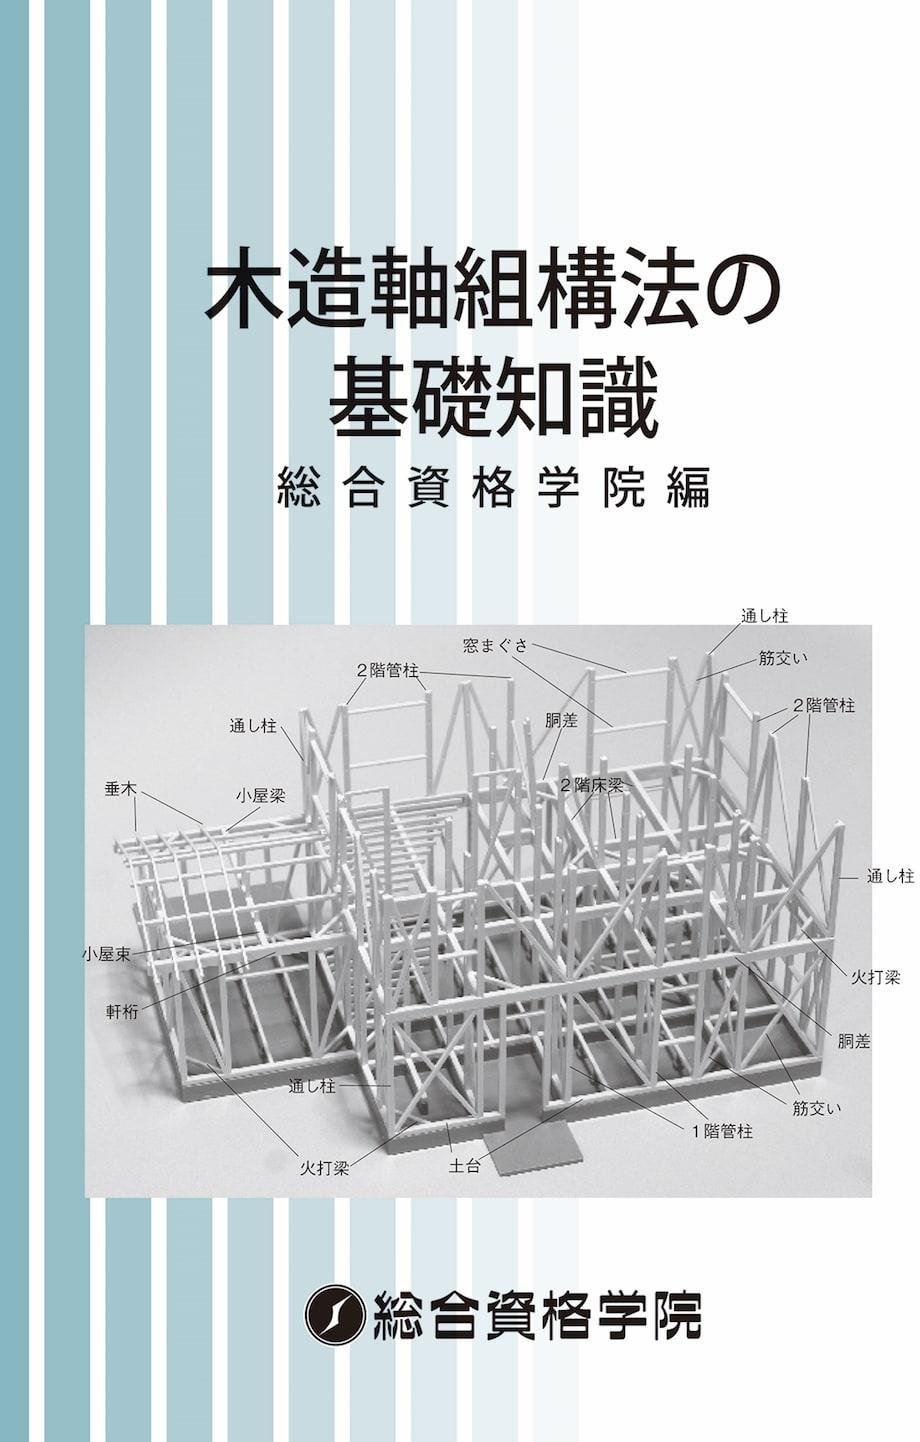 大型本『建築模型で学ぶ!木造軸組構法の基本[第3版]』付録冊子